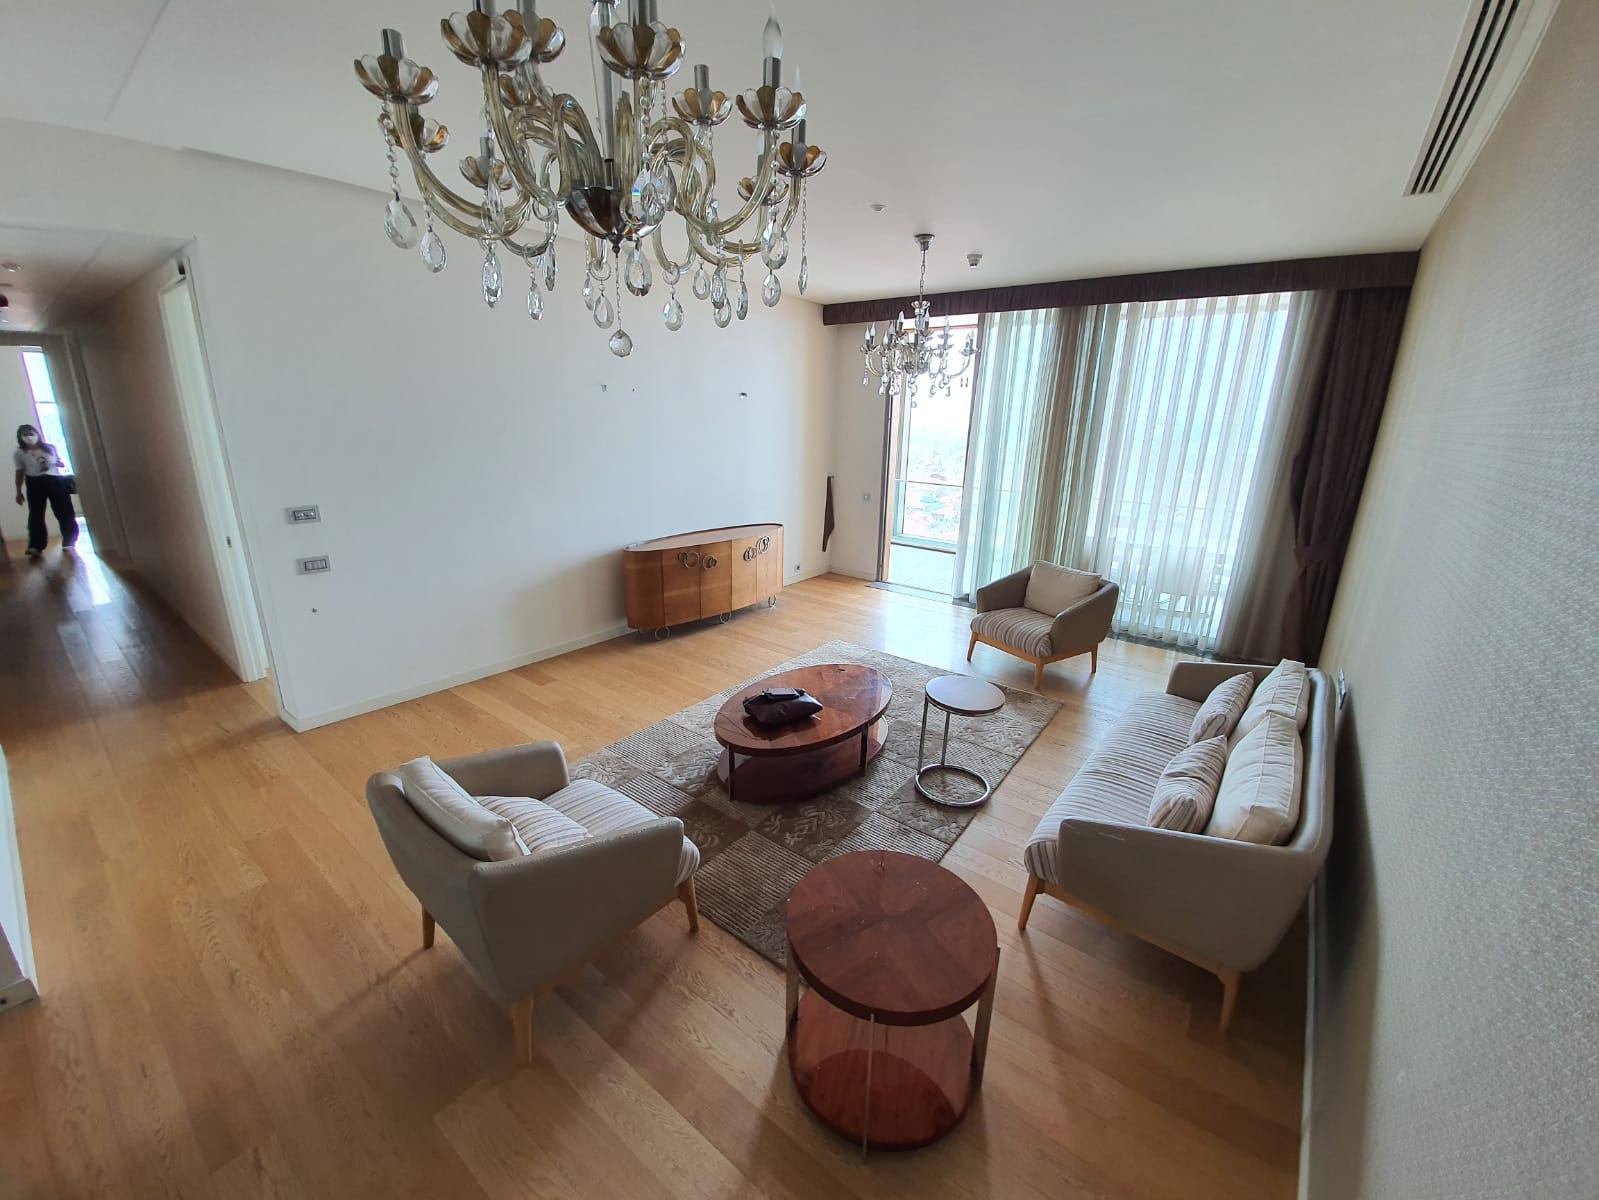 apartments-residence-sapphire-tower-11th-floor-003.jpg